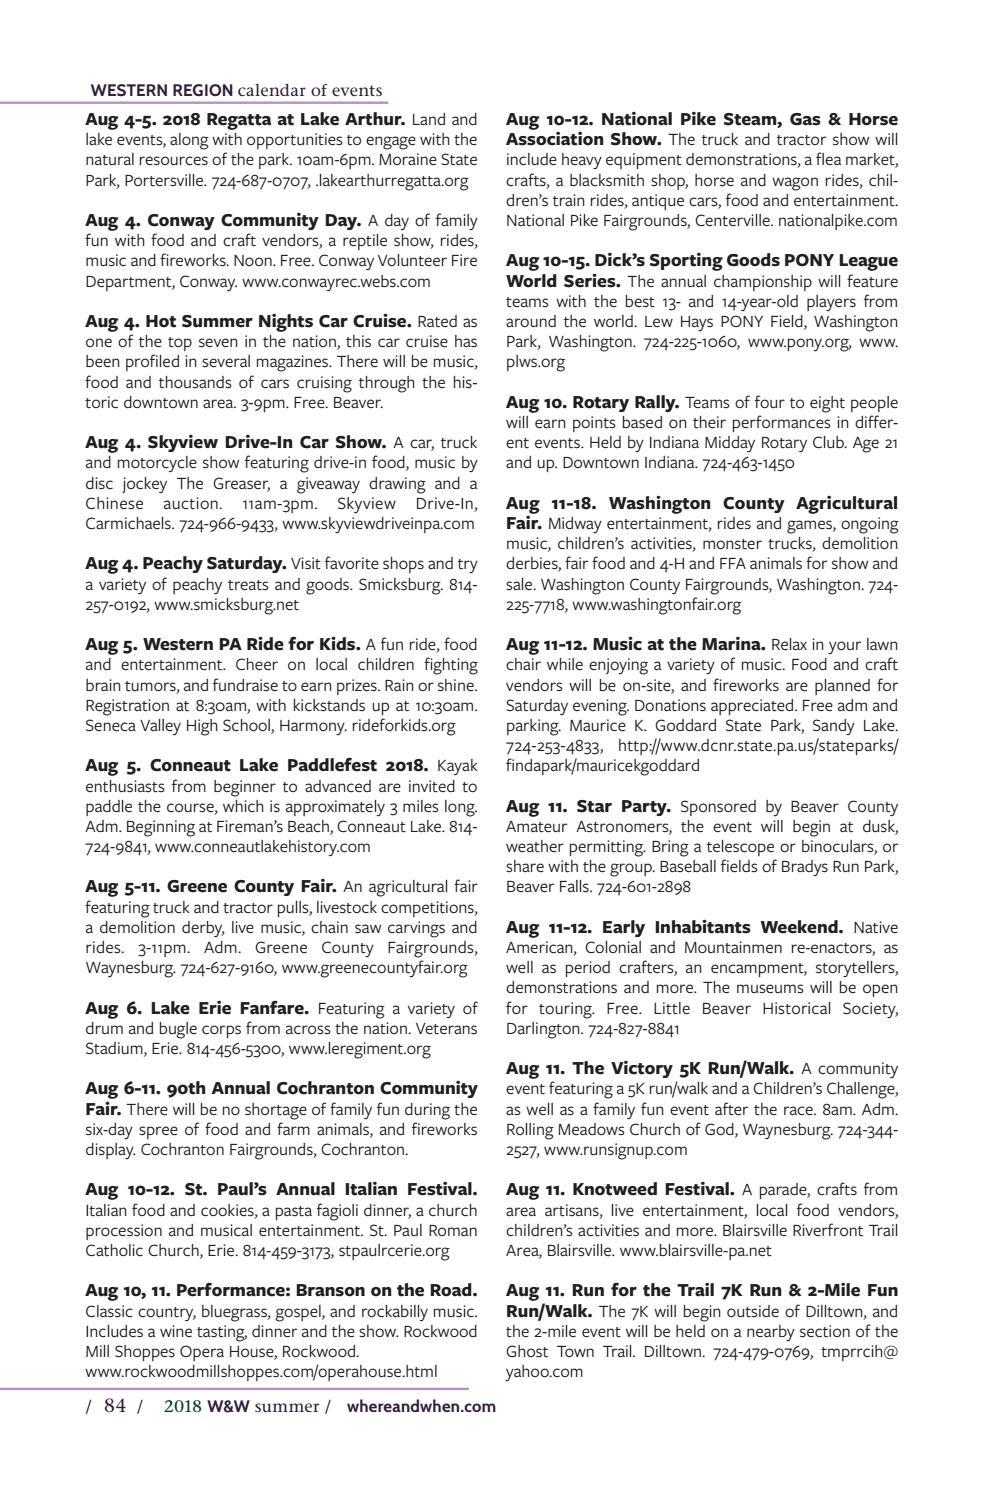 Summer 2018 Where & When Pennsylvanias Travel Guide by Where